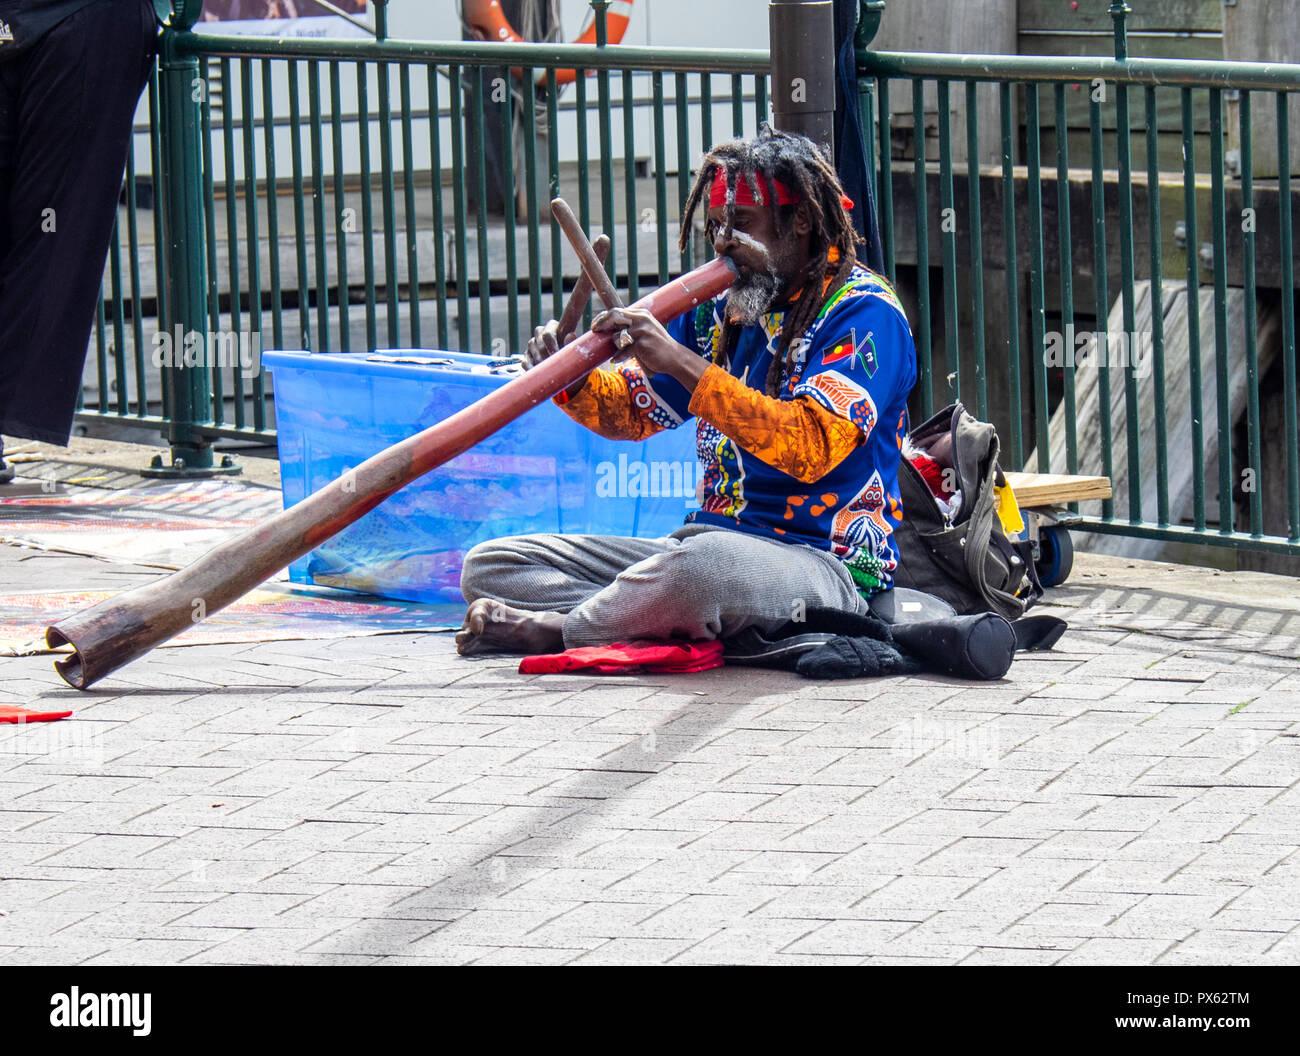 Indigenous aboriginal man playing the didgeridoo musical instrument in Circular Quay Sydney NSW Australia. - Stock Image